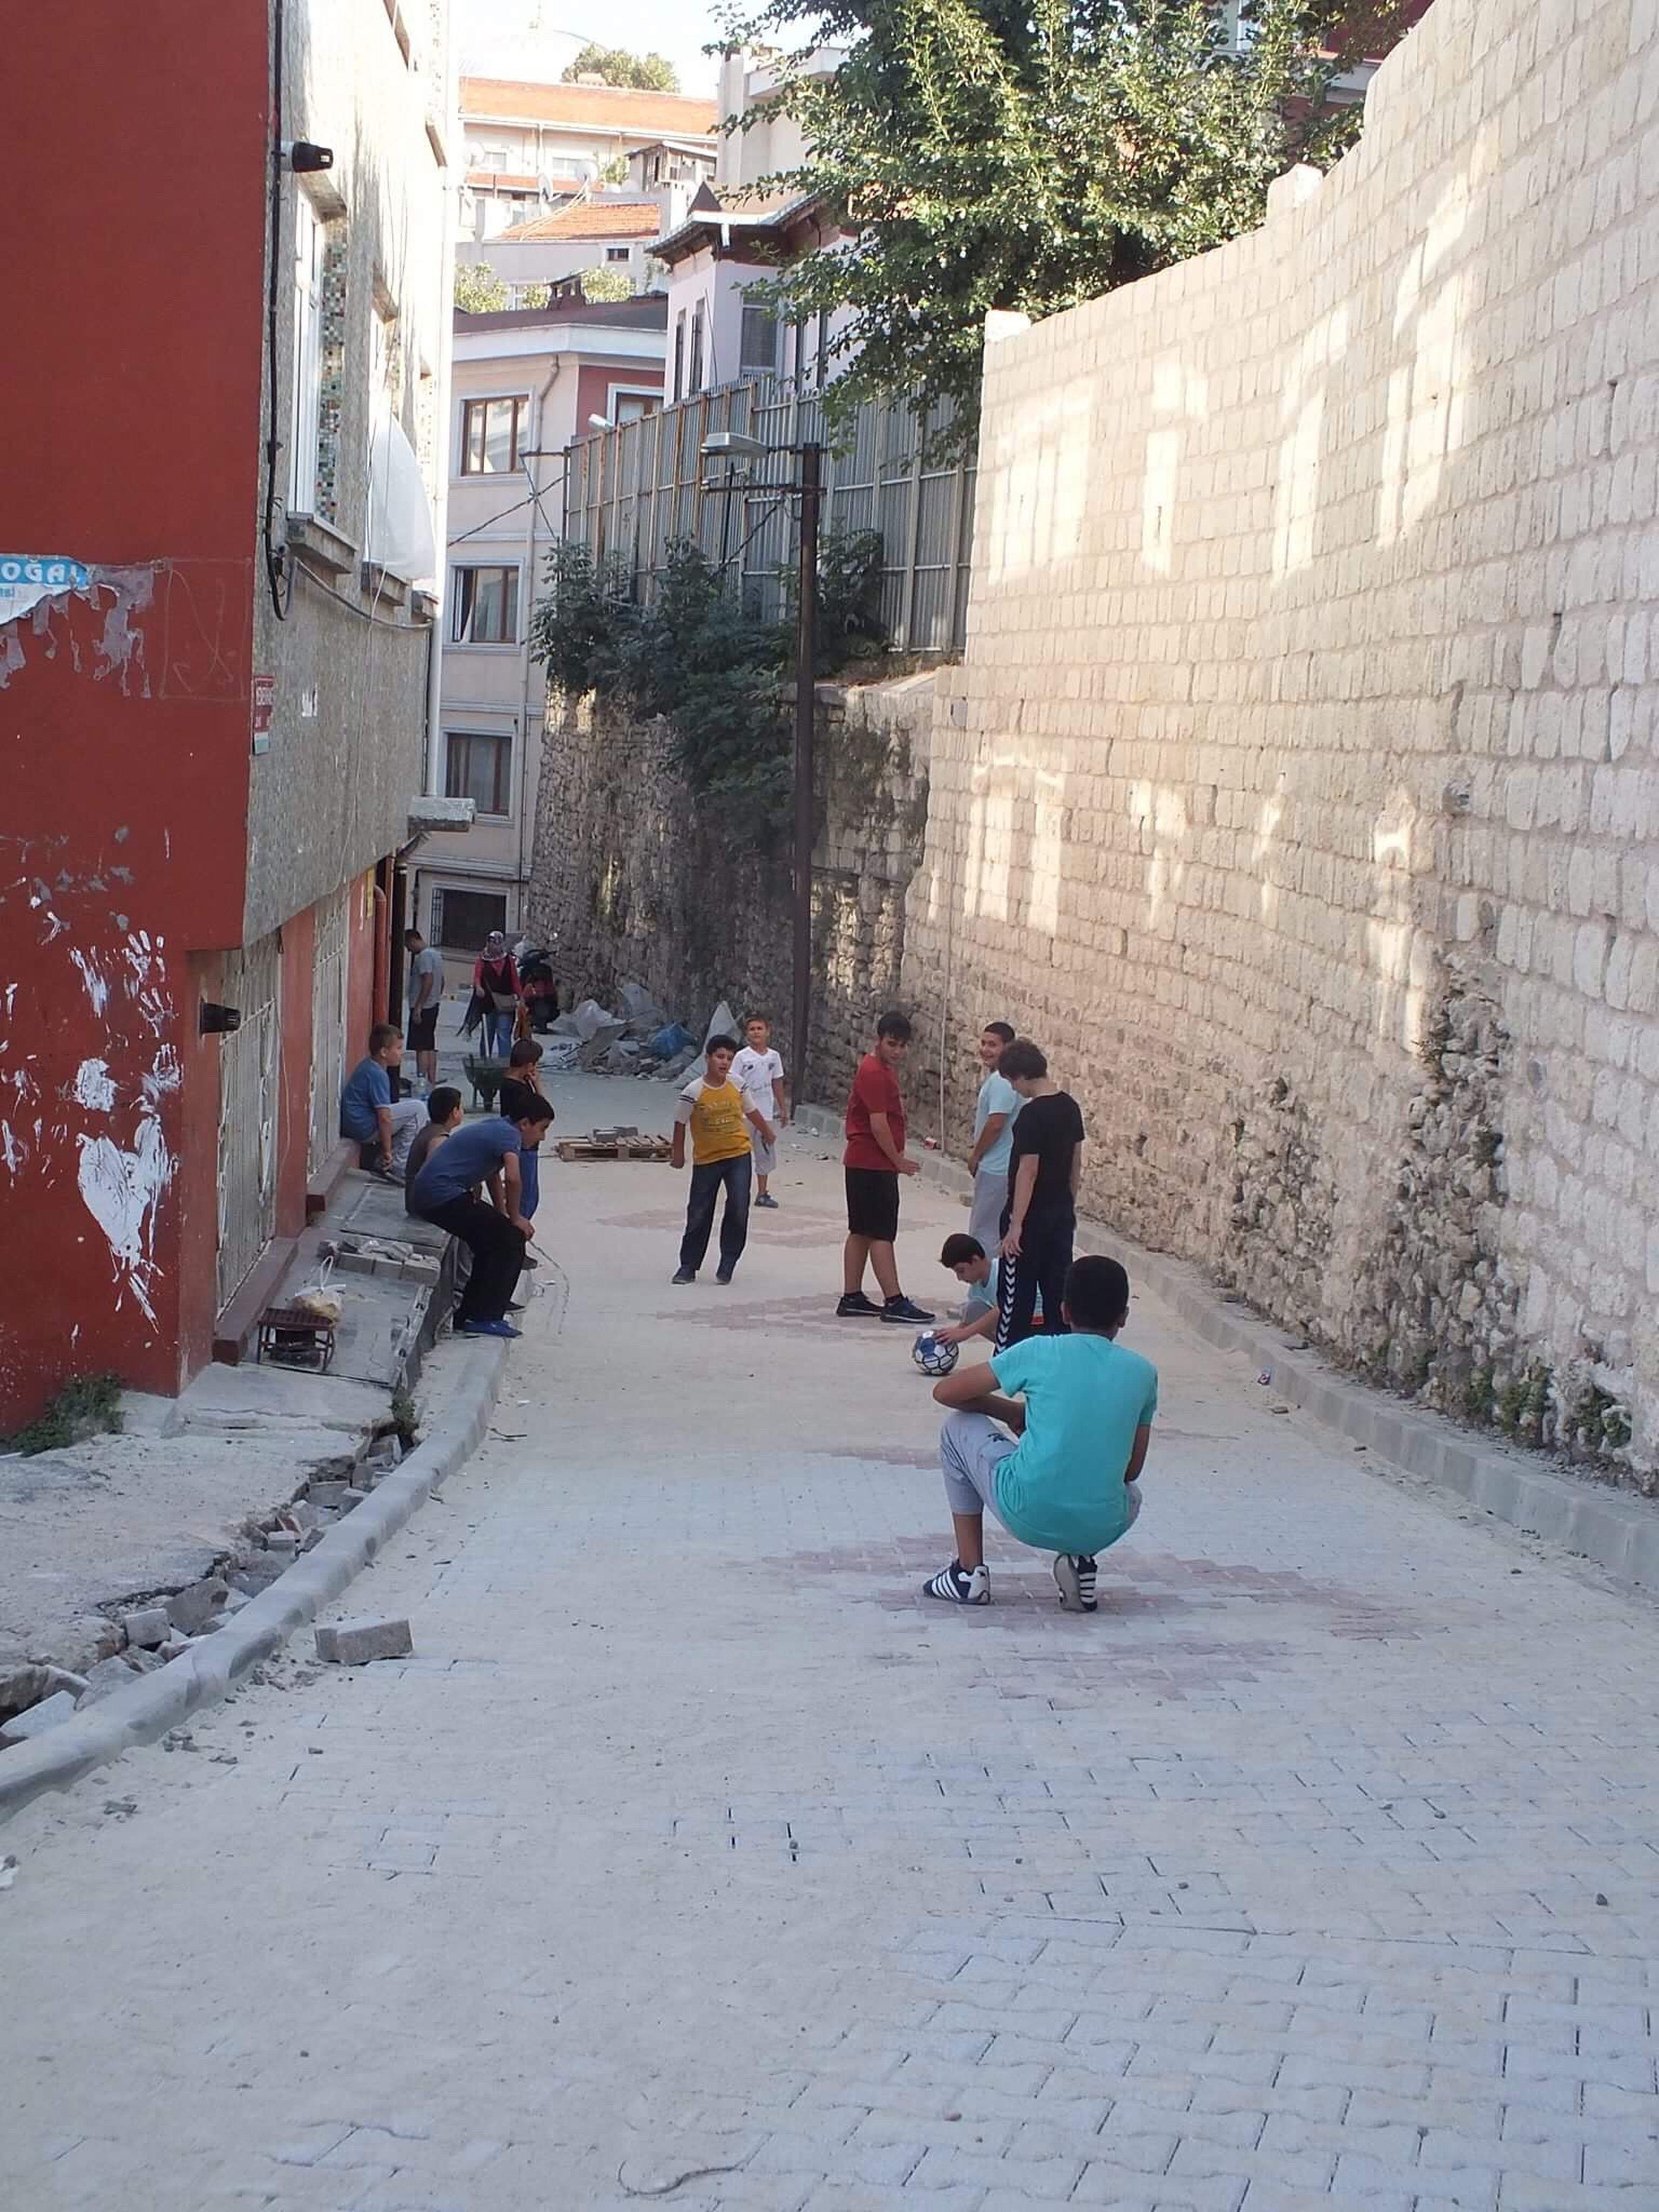 Building Exterior Built Structure Architecture Real People Men Lifestyles Outdoors Day Women People Turkey Türkiye Turkishfollowers Tagsforlikes Life Balat Amazing Good Morning Tb